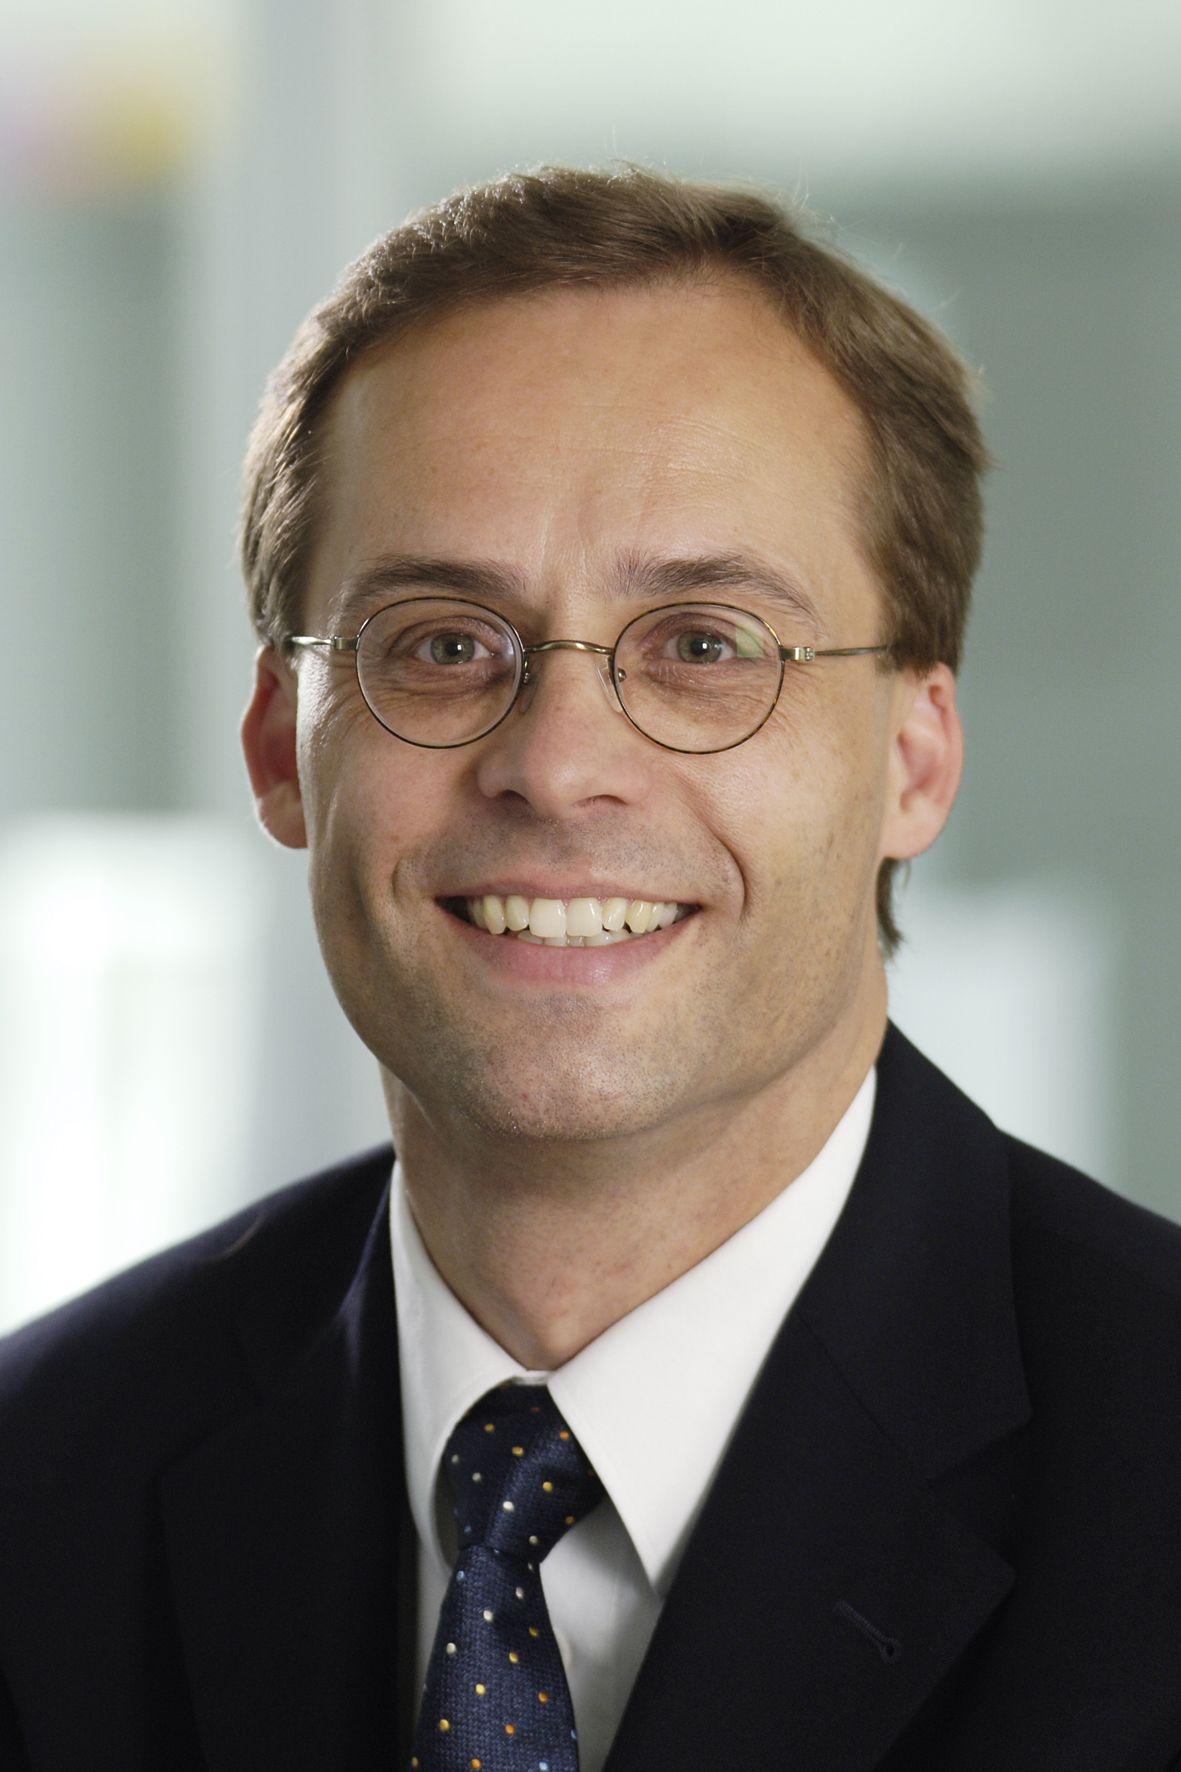 Experteninterview: Prof. Dr. Christoph Bauer